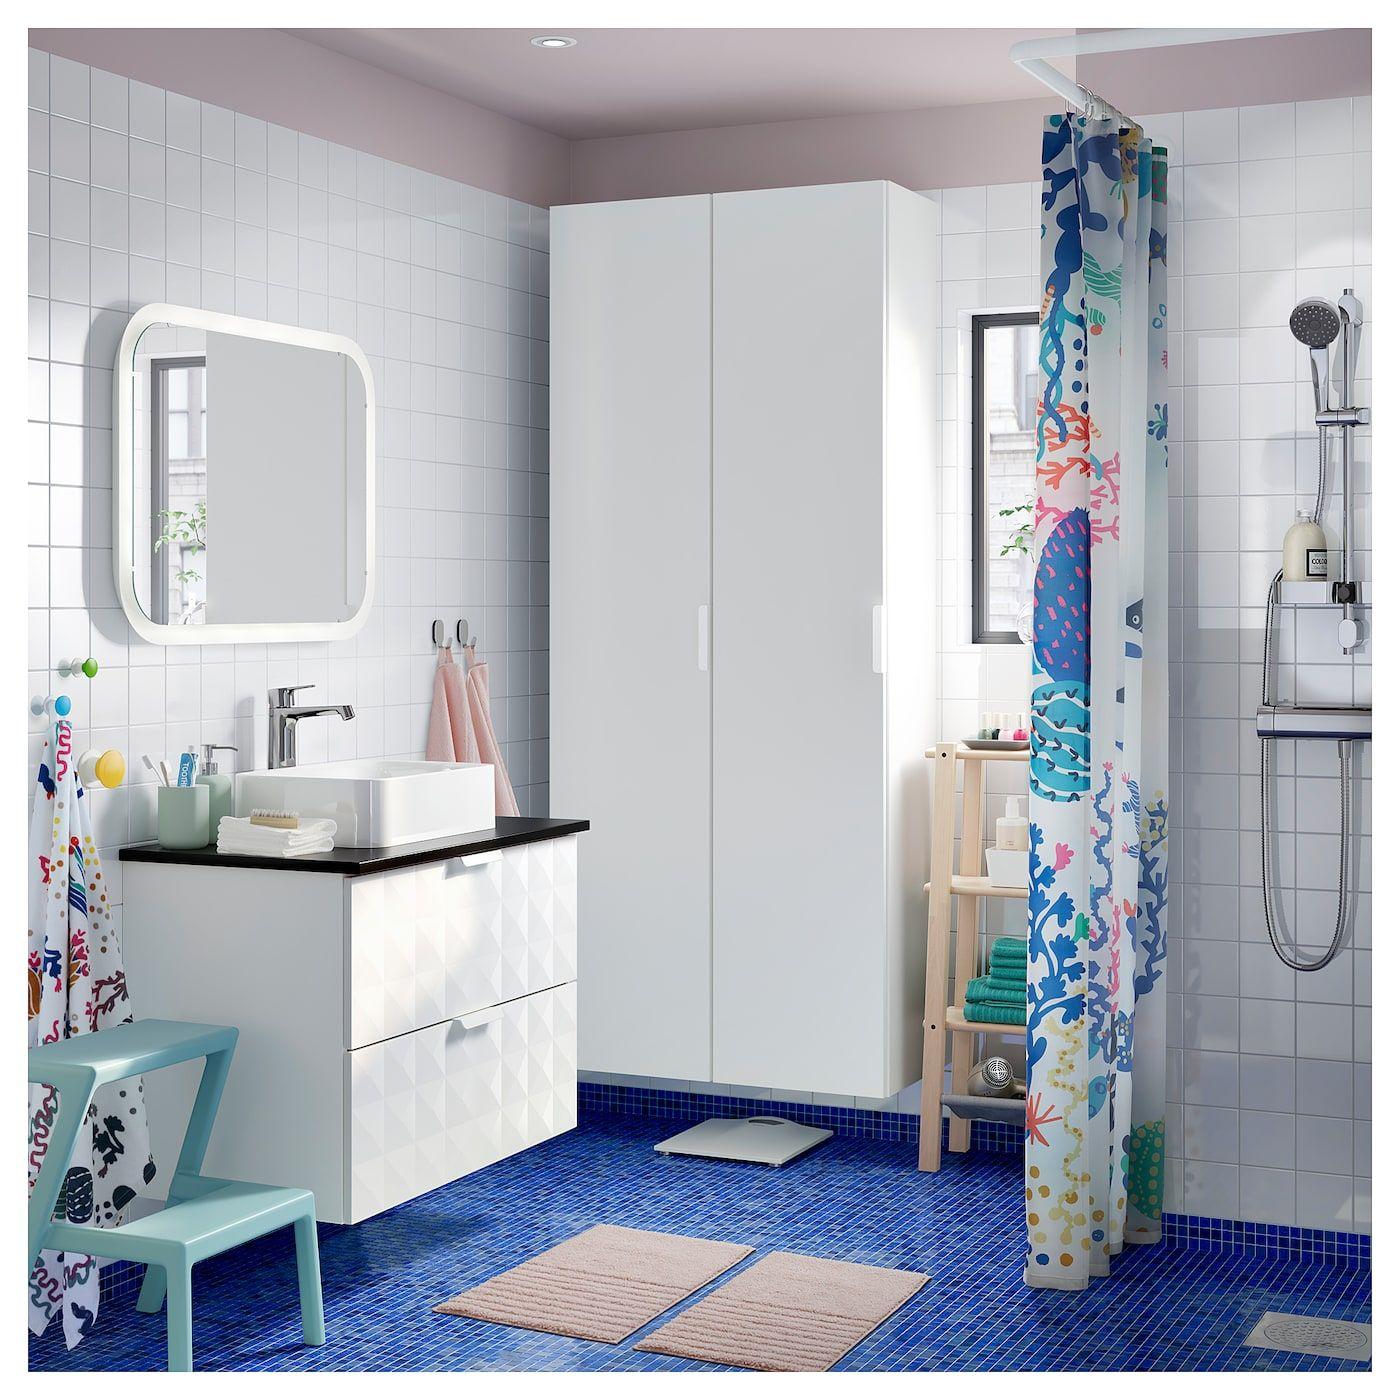 IKEA LASJÖN Shower curtain multicolor Bathroom